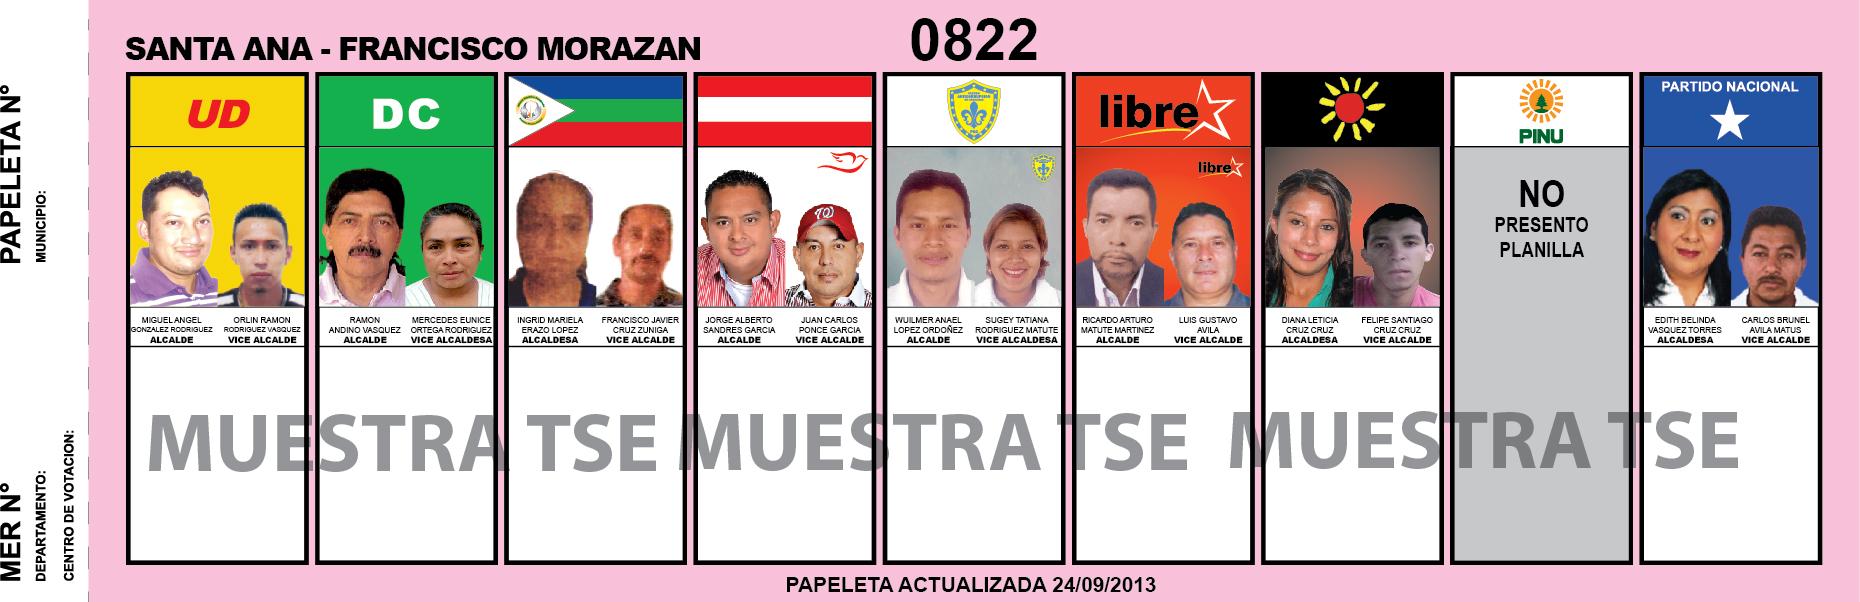 CANDIDATOS 2013 MUNICIPIO SANTA ANA - FRANCISCO MORAZAN - HONDURAS